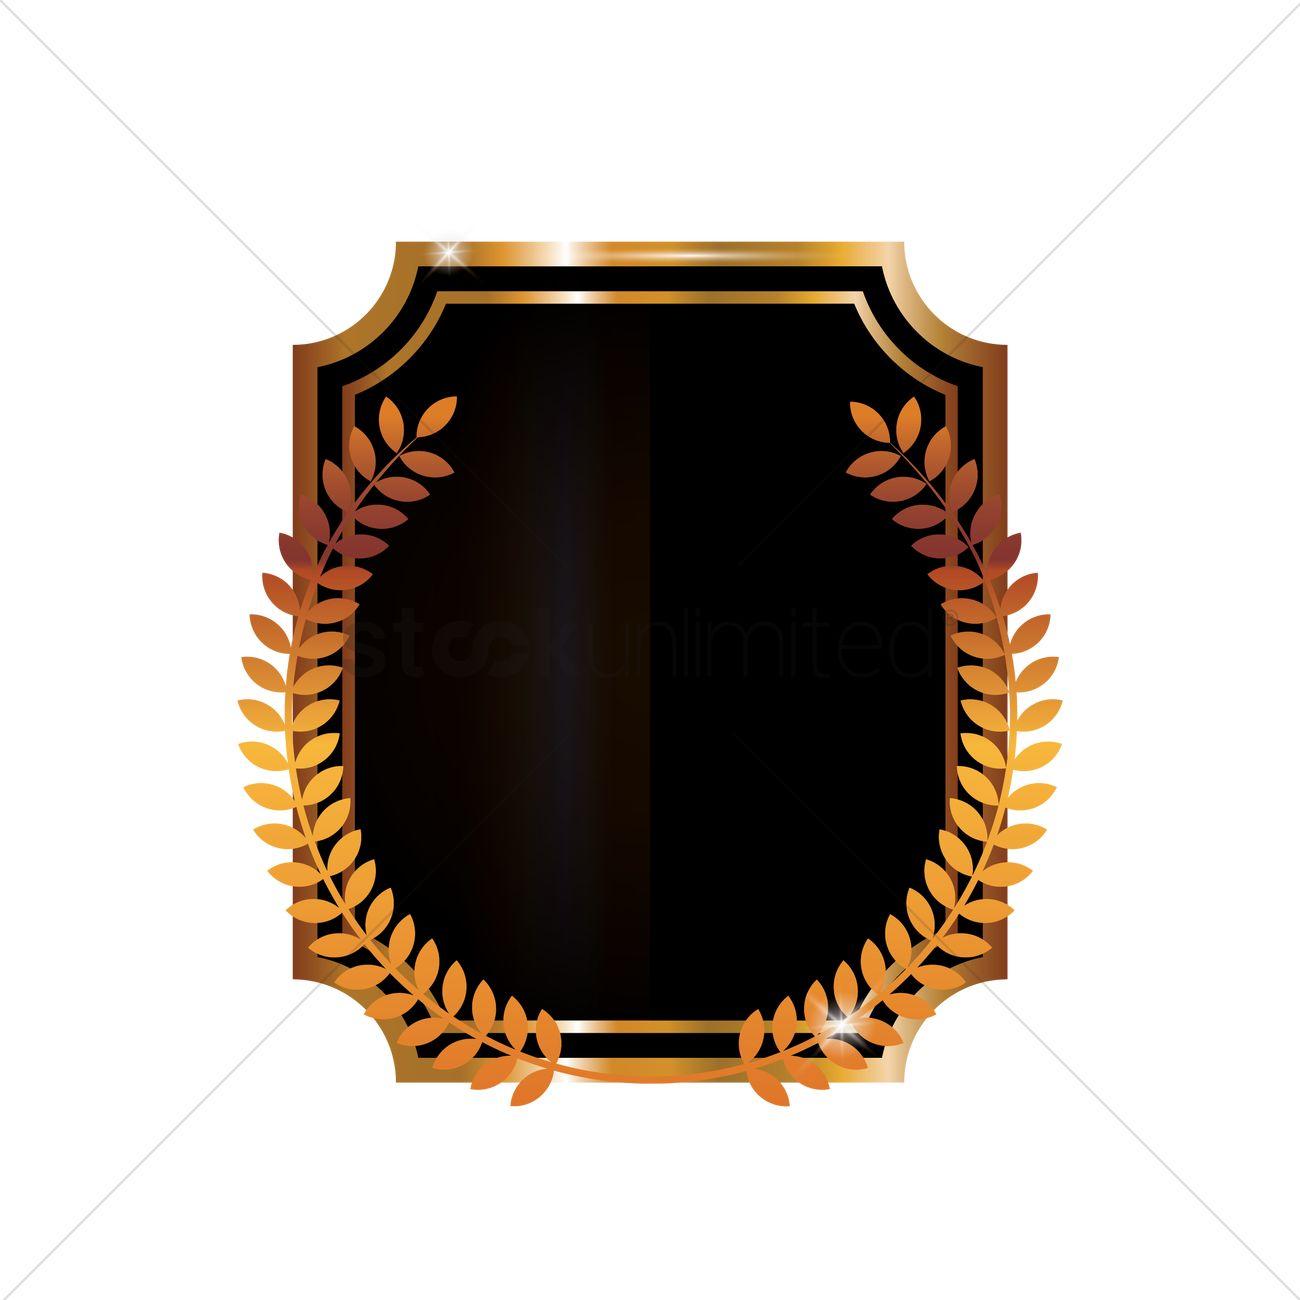 Black shield emblem vector image 1874319 stockunlimited black shield emblem vector graphic buycottarizona Image collections